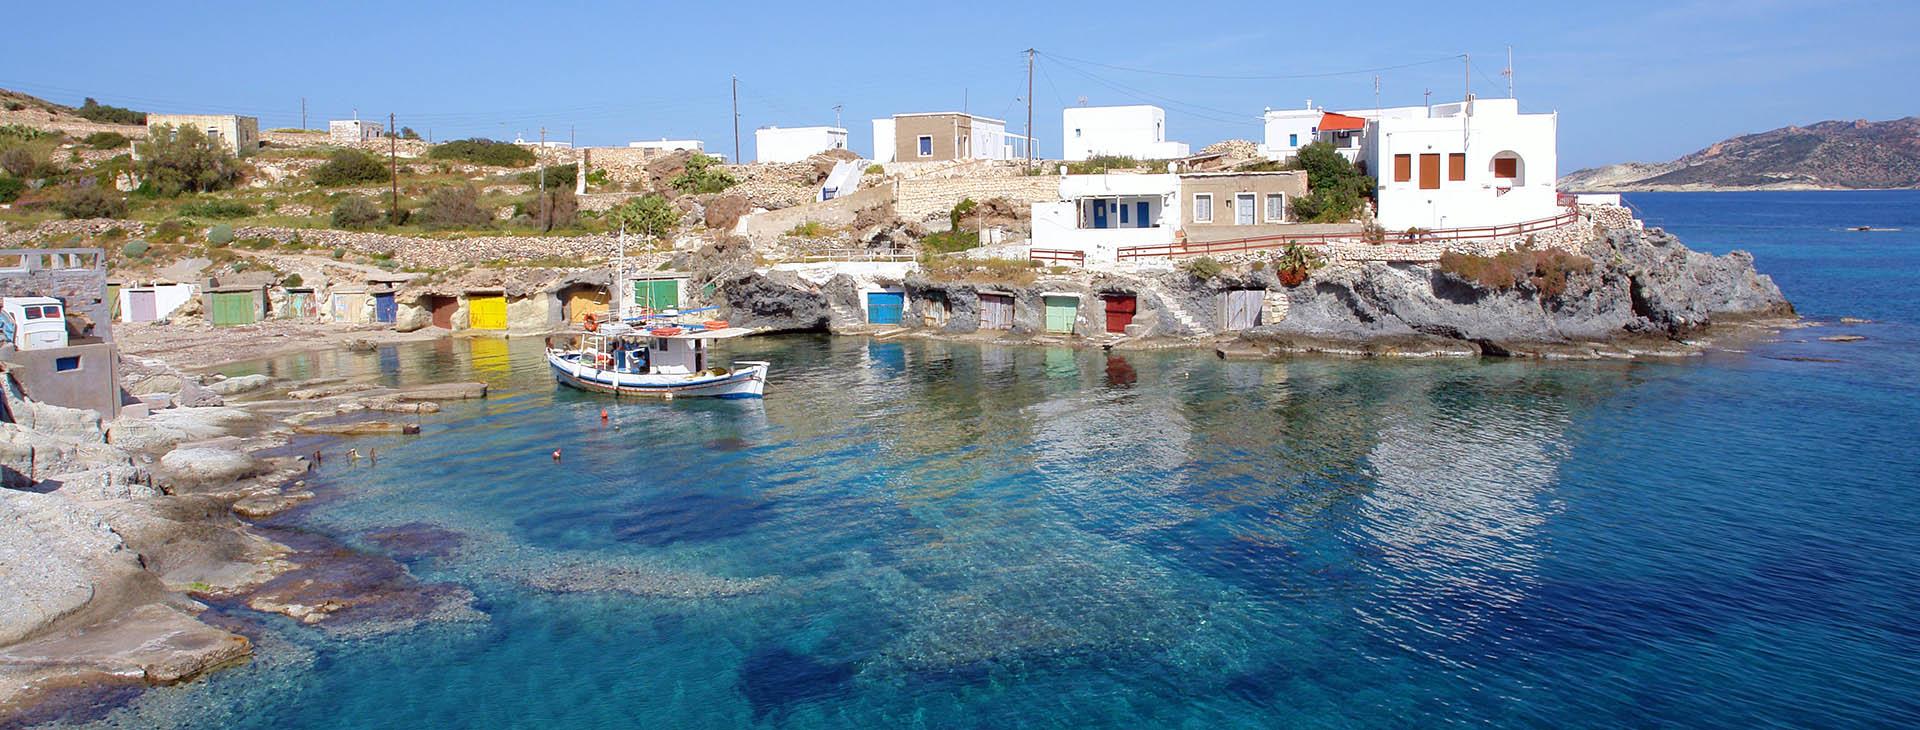 Goupa-Kara, Kimolos island